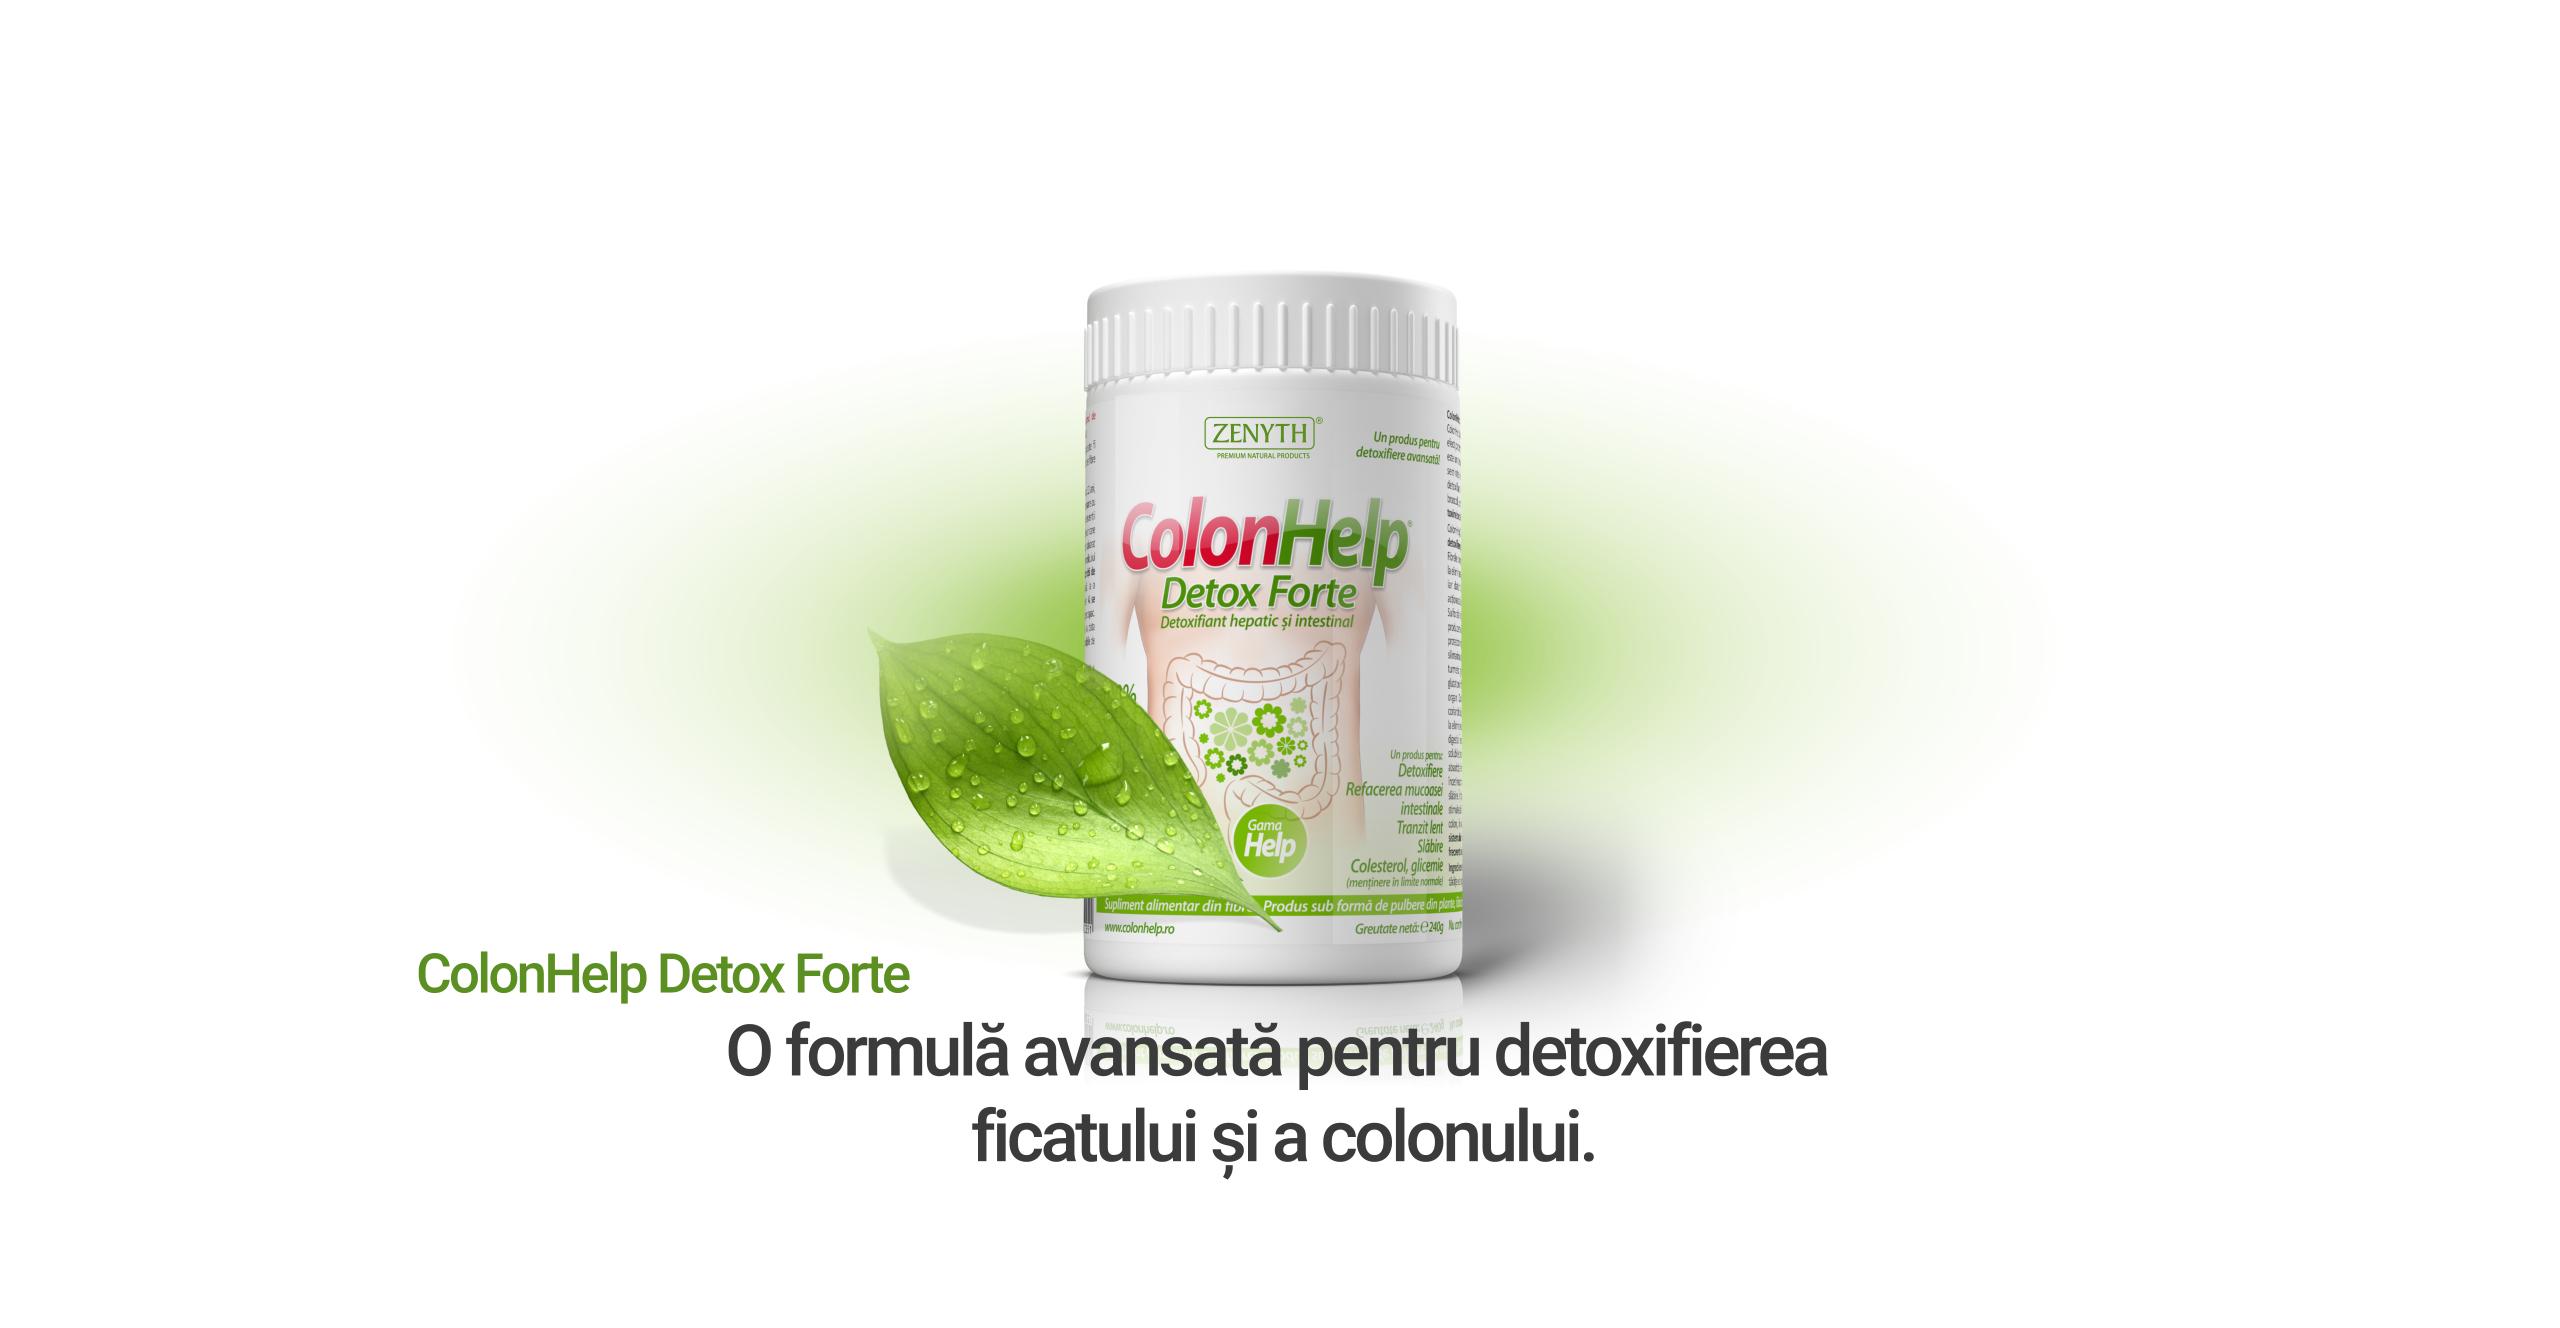 detoxifierea colonului hepatic hpv remede de grand mere